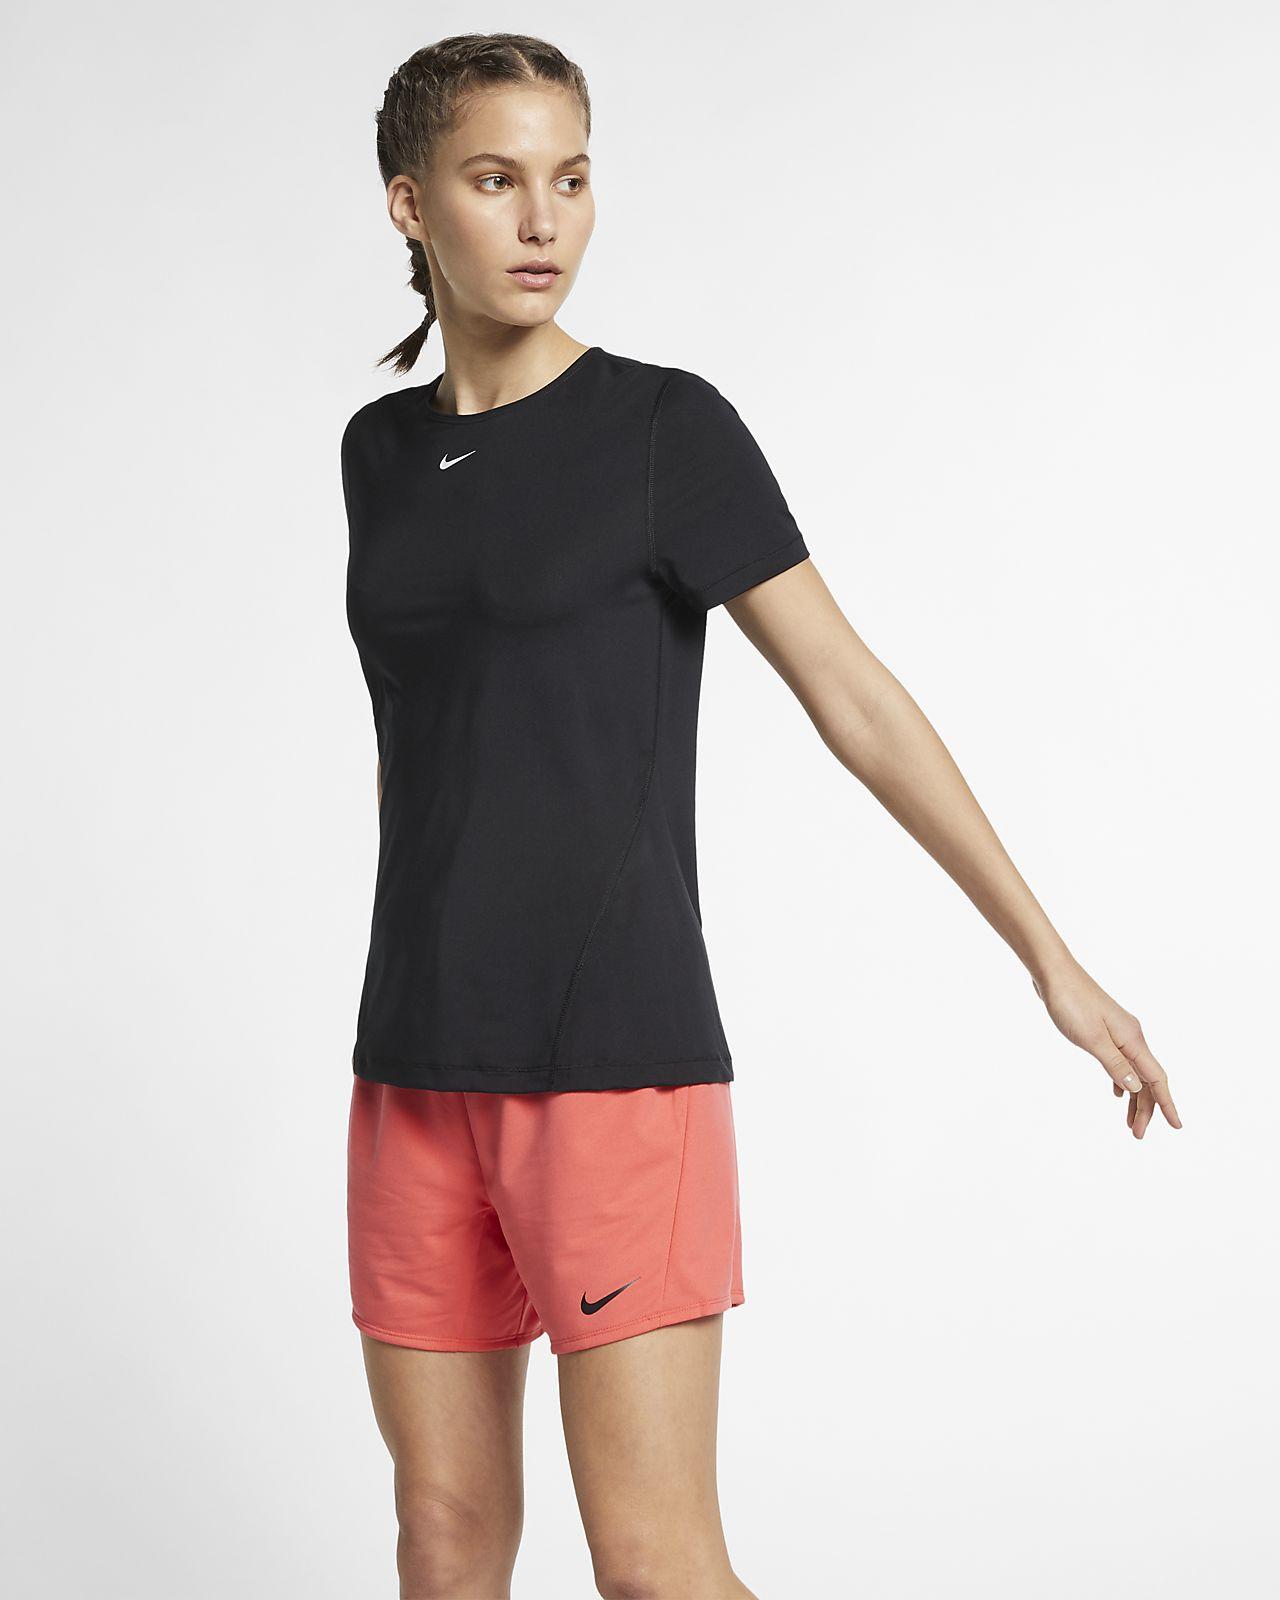 Nike Pro Women's Short Sleeve Mesh Training Top